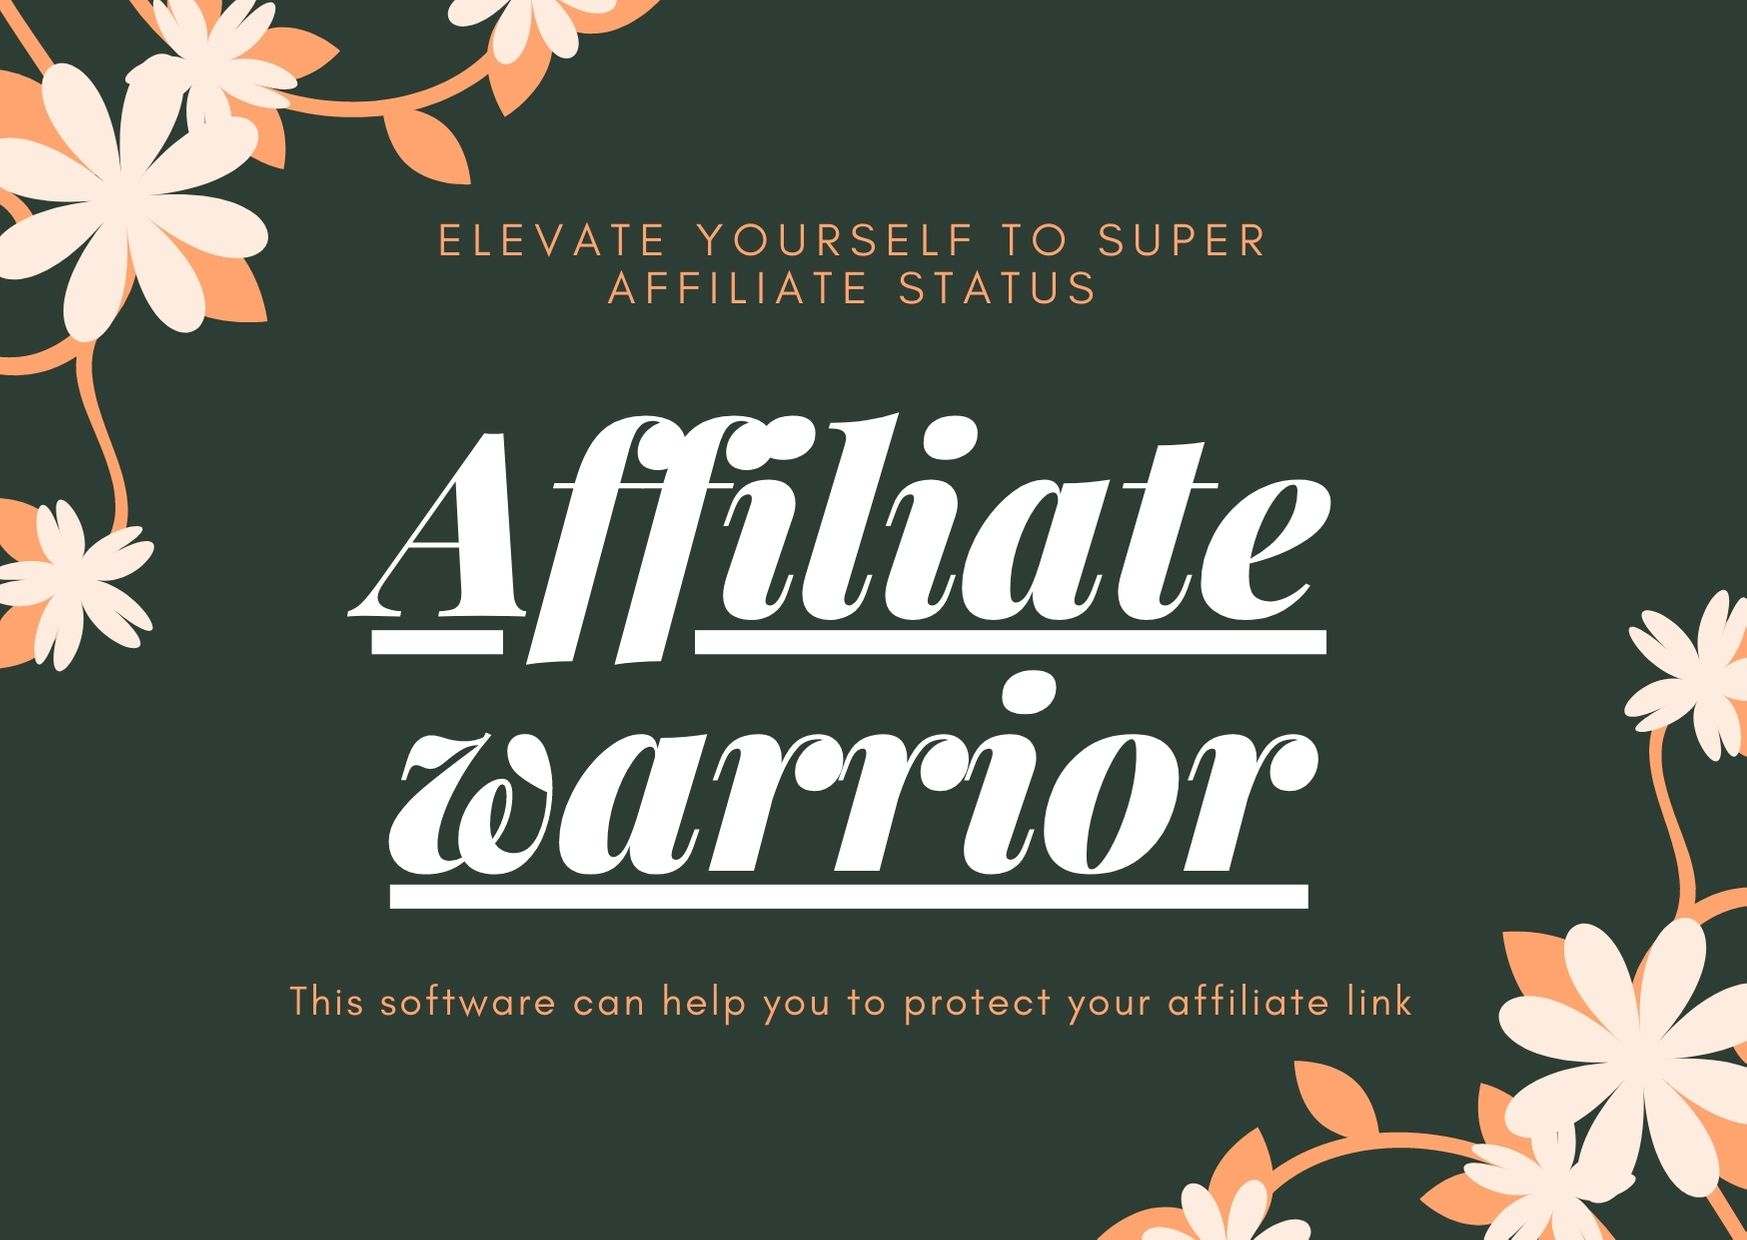 Elevate yourself to super affiliate status